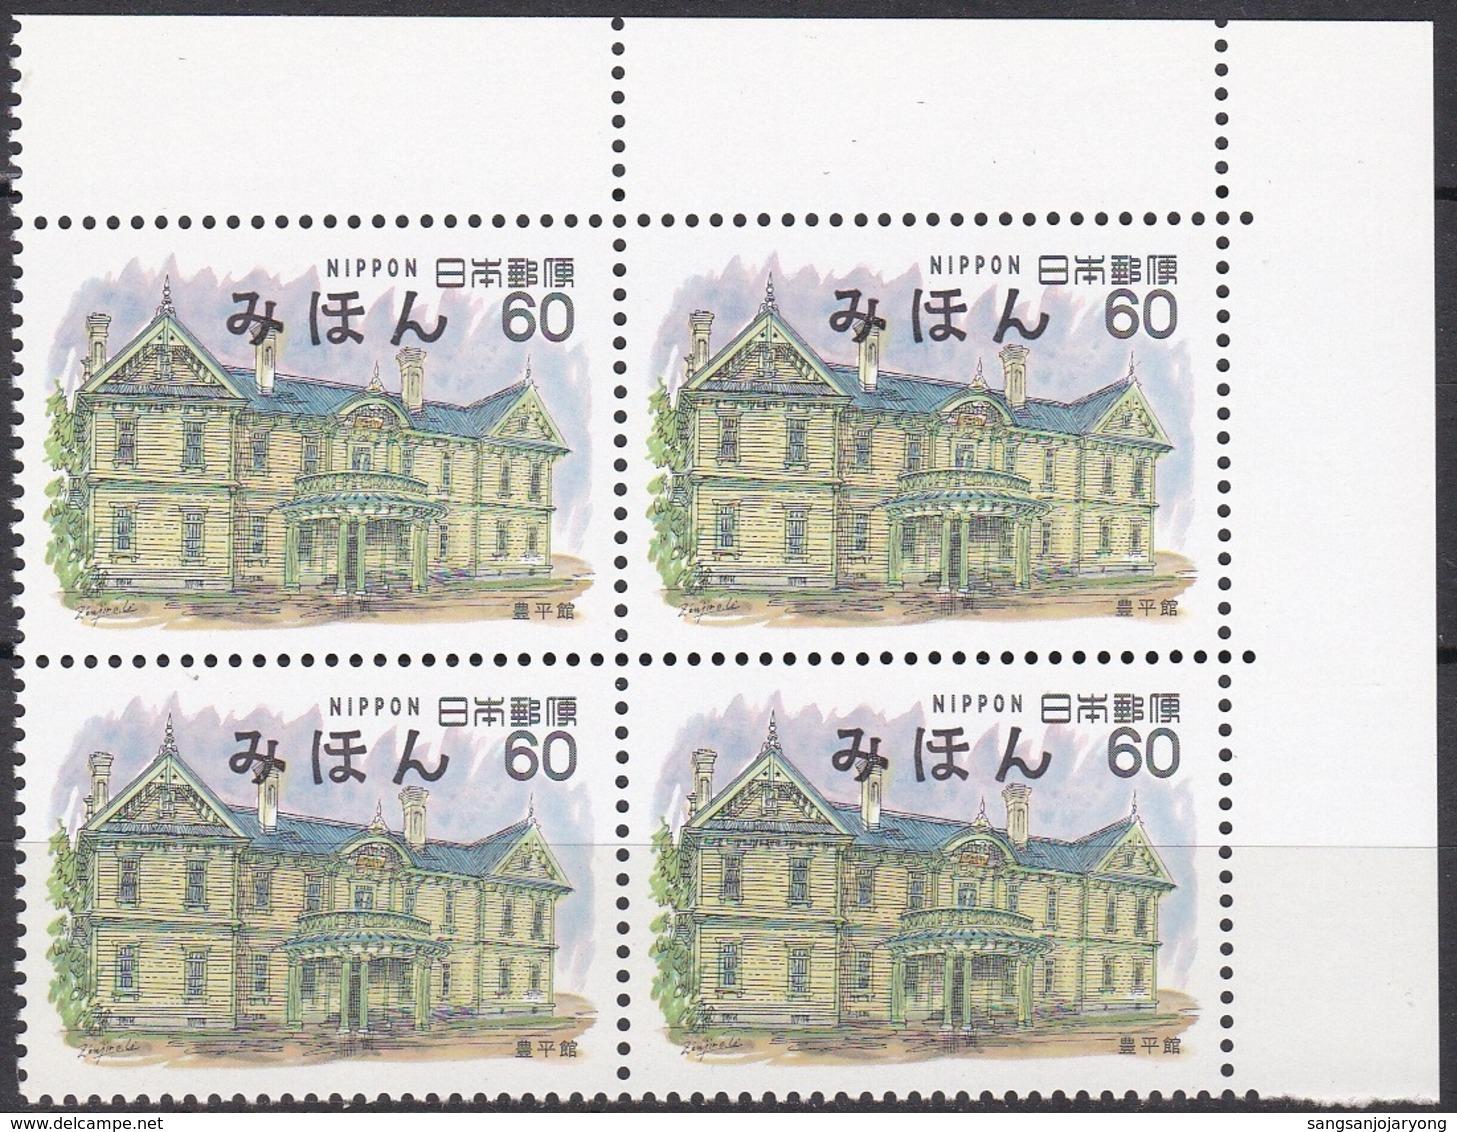 Specimen Block, Japan Sc1523 Western Architecture, Old Glover House, Nagasaki - Architecture